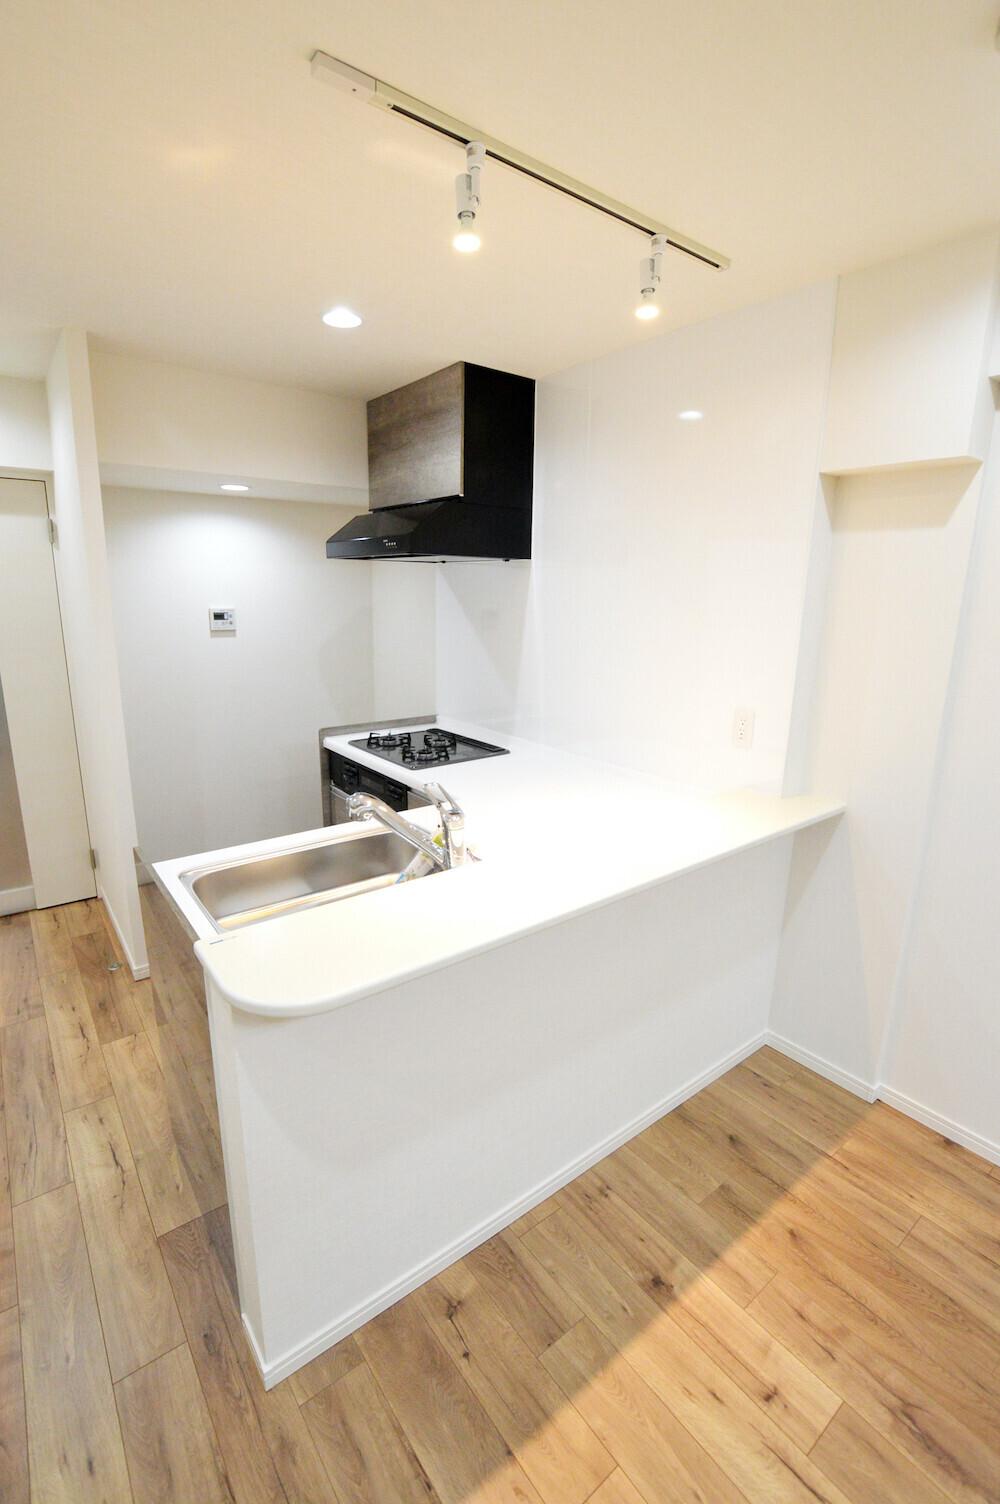 L型キッチン、マンションフルリノベーション(比較画像あり)の建築事例写真